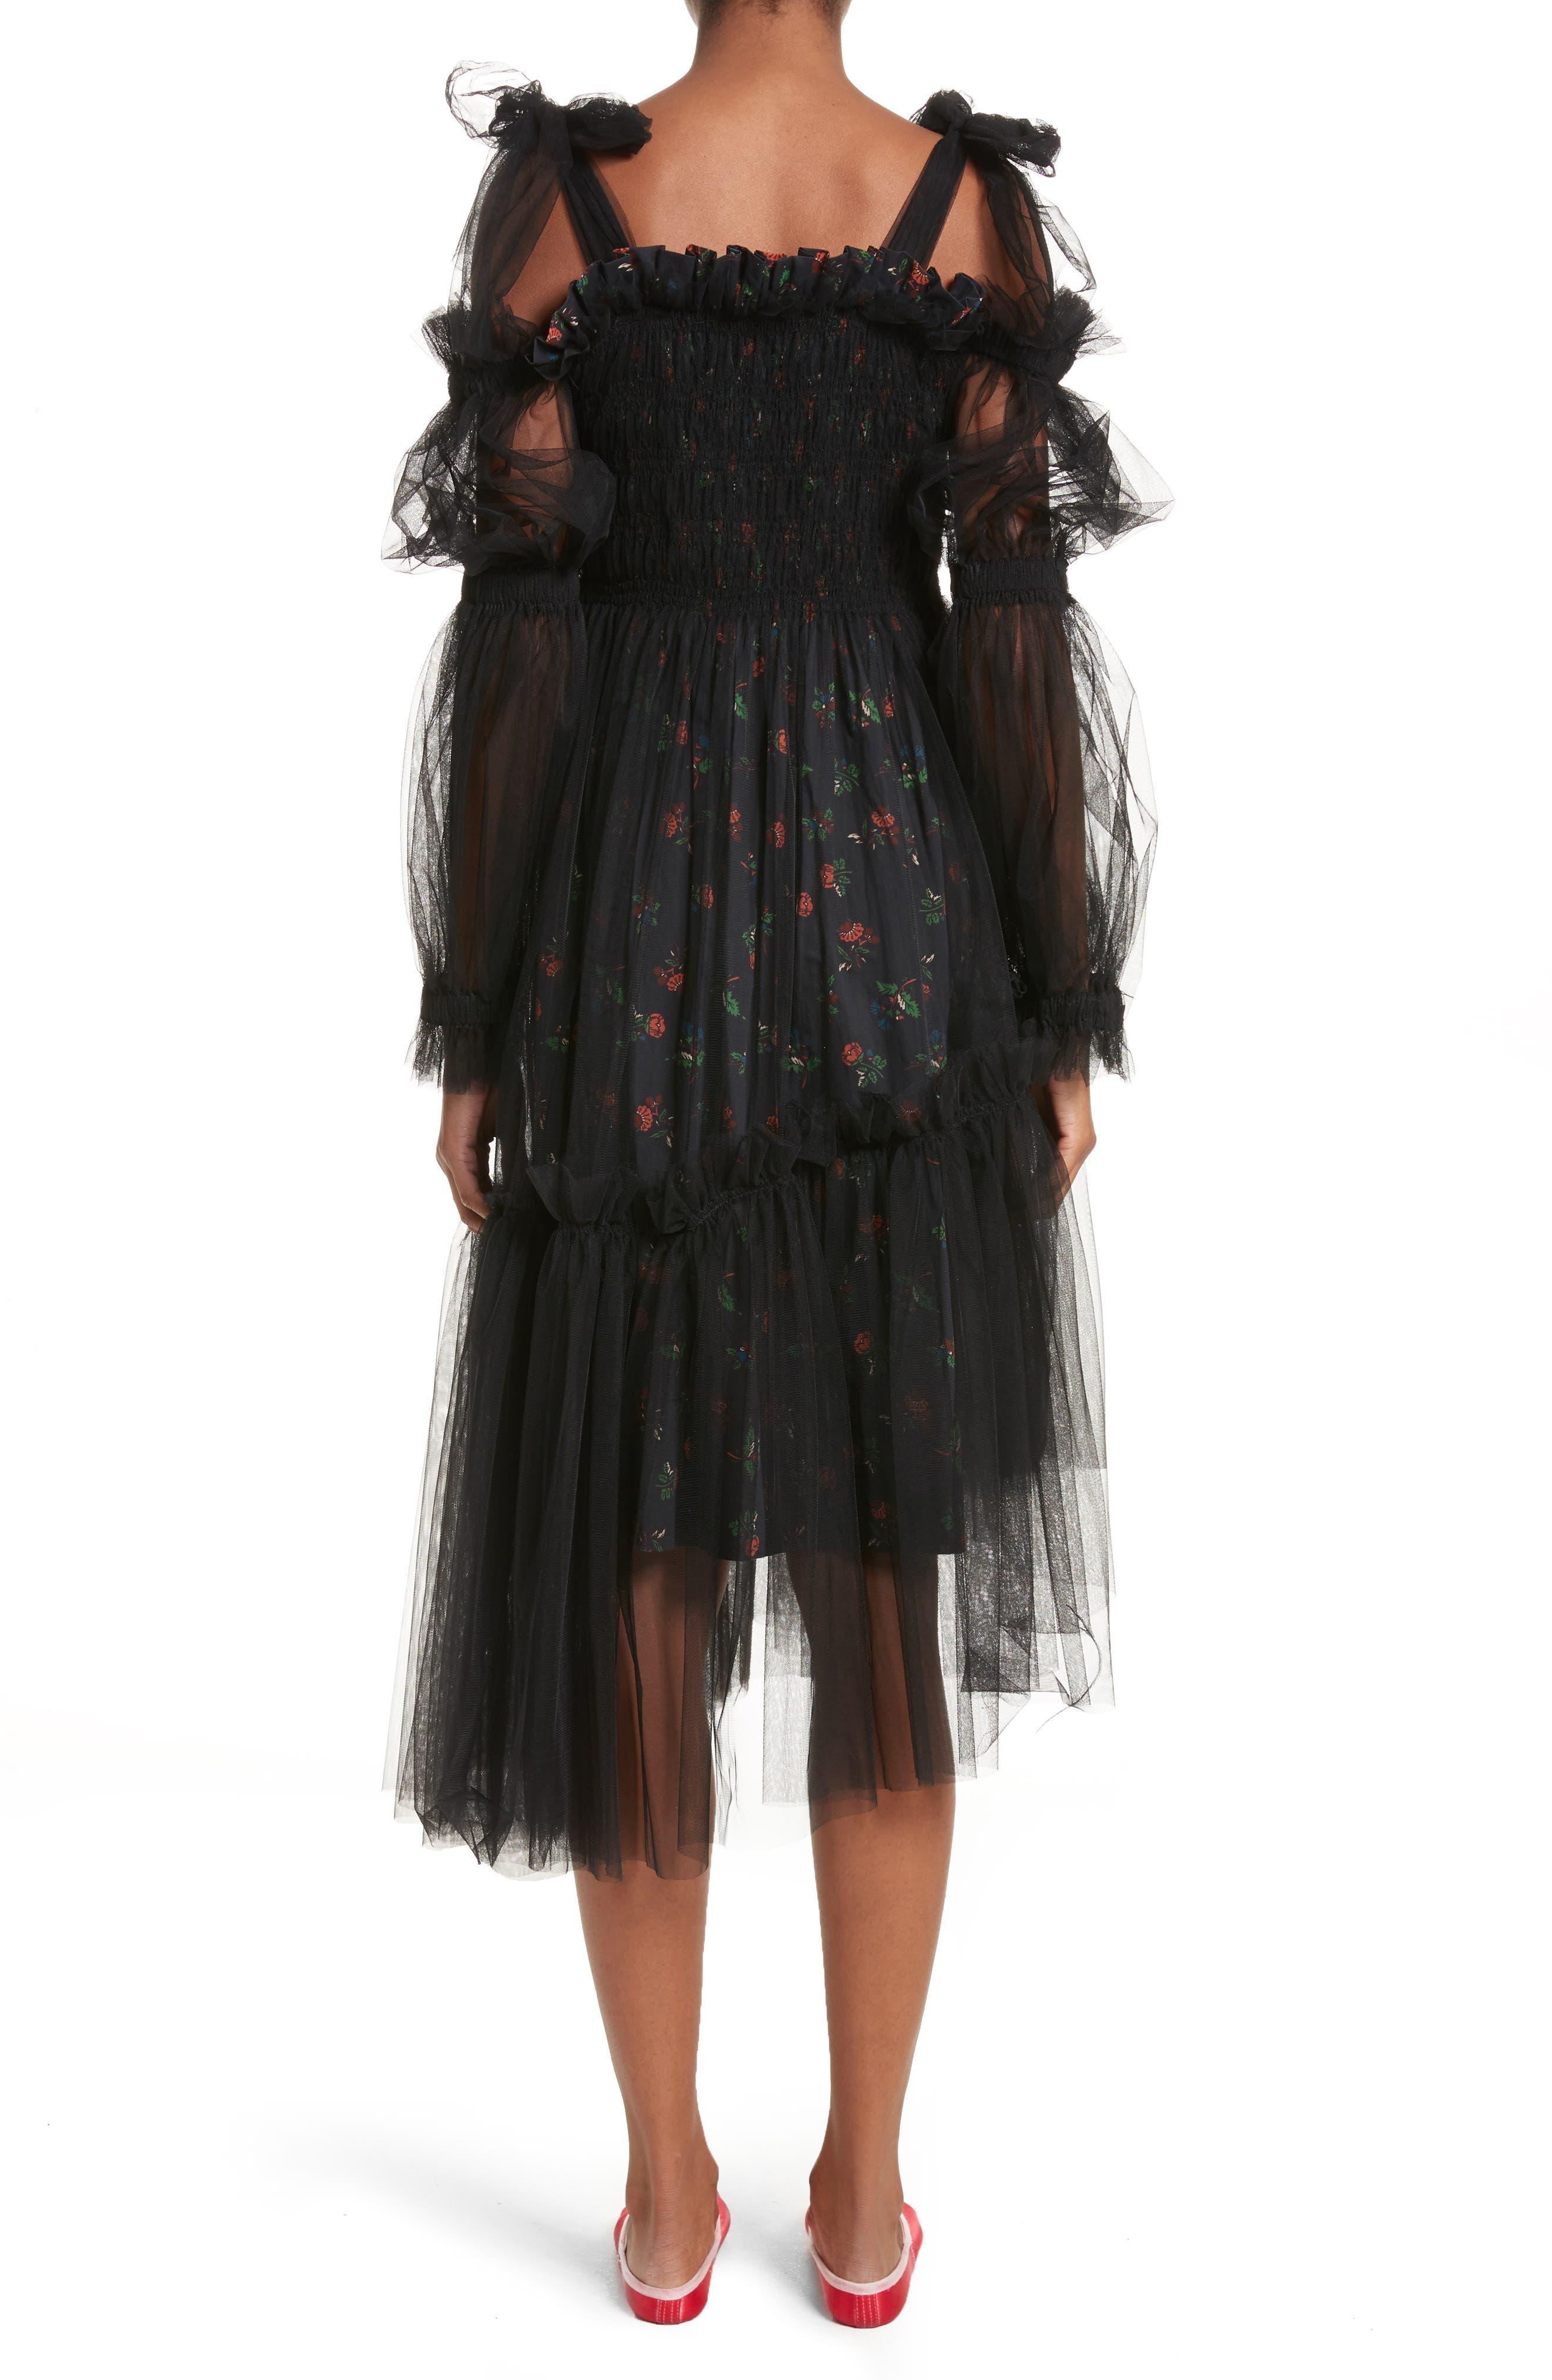 Ruby Tulle Floral Dress,                             Alternate thumbnail 2, color,                             Black